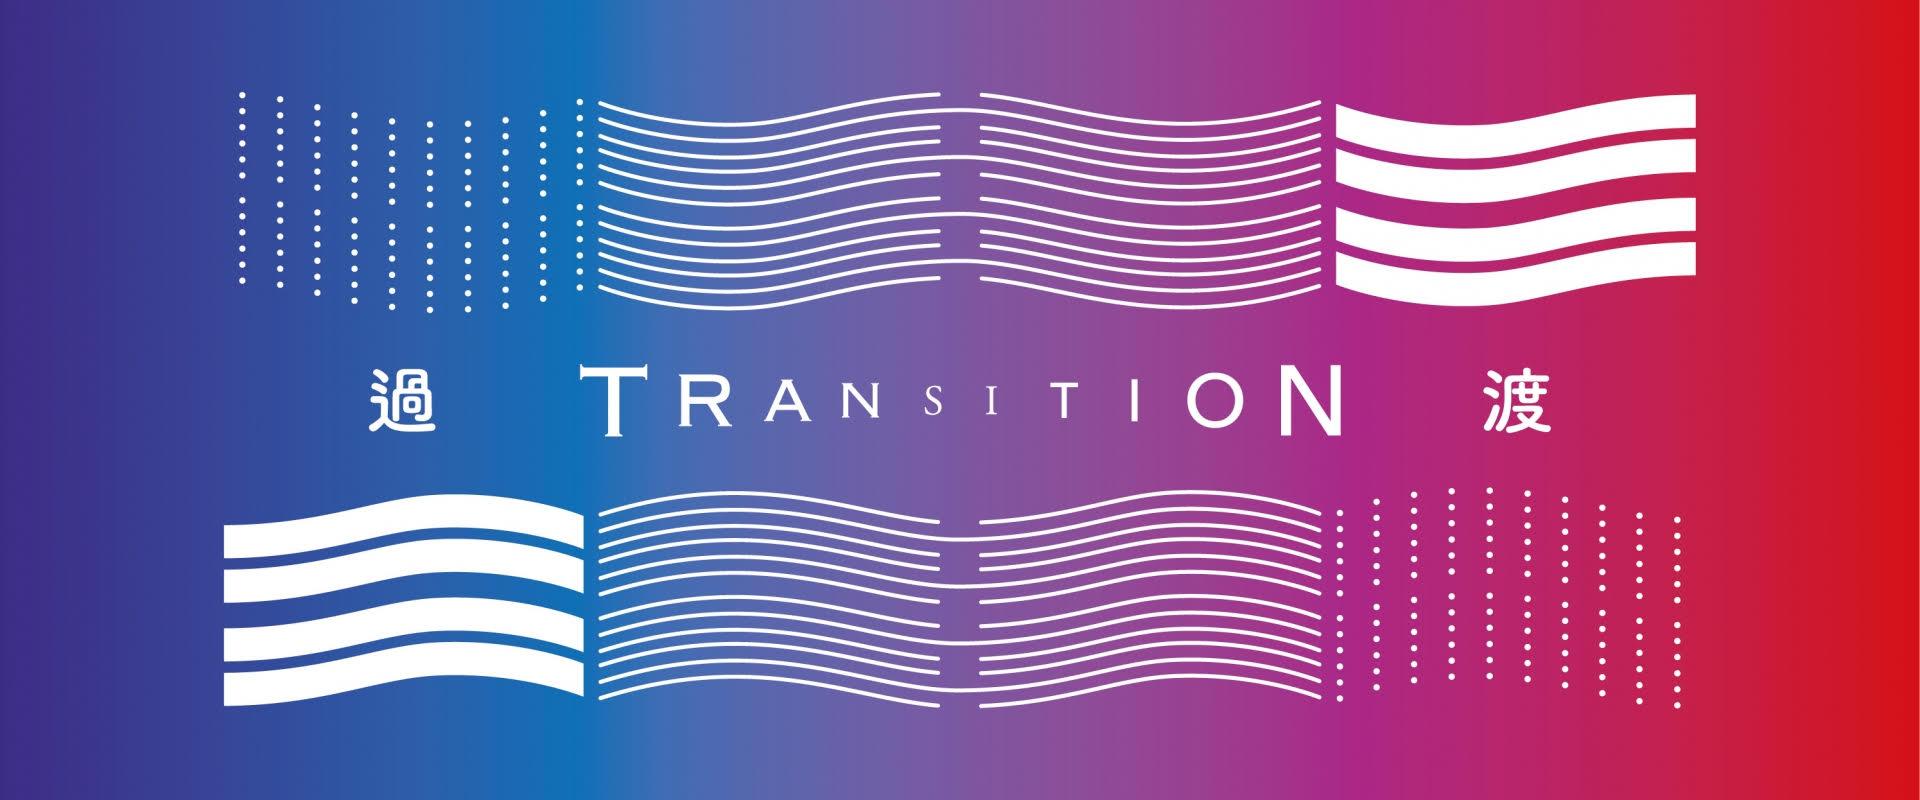 WMA Masters 2017/18 Transition - logo